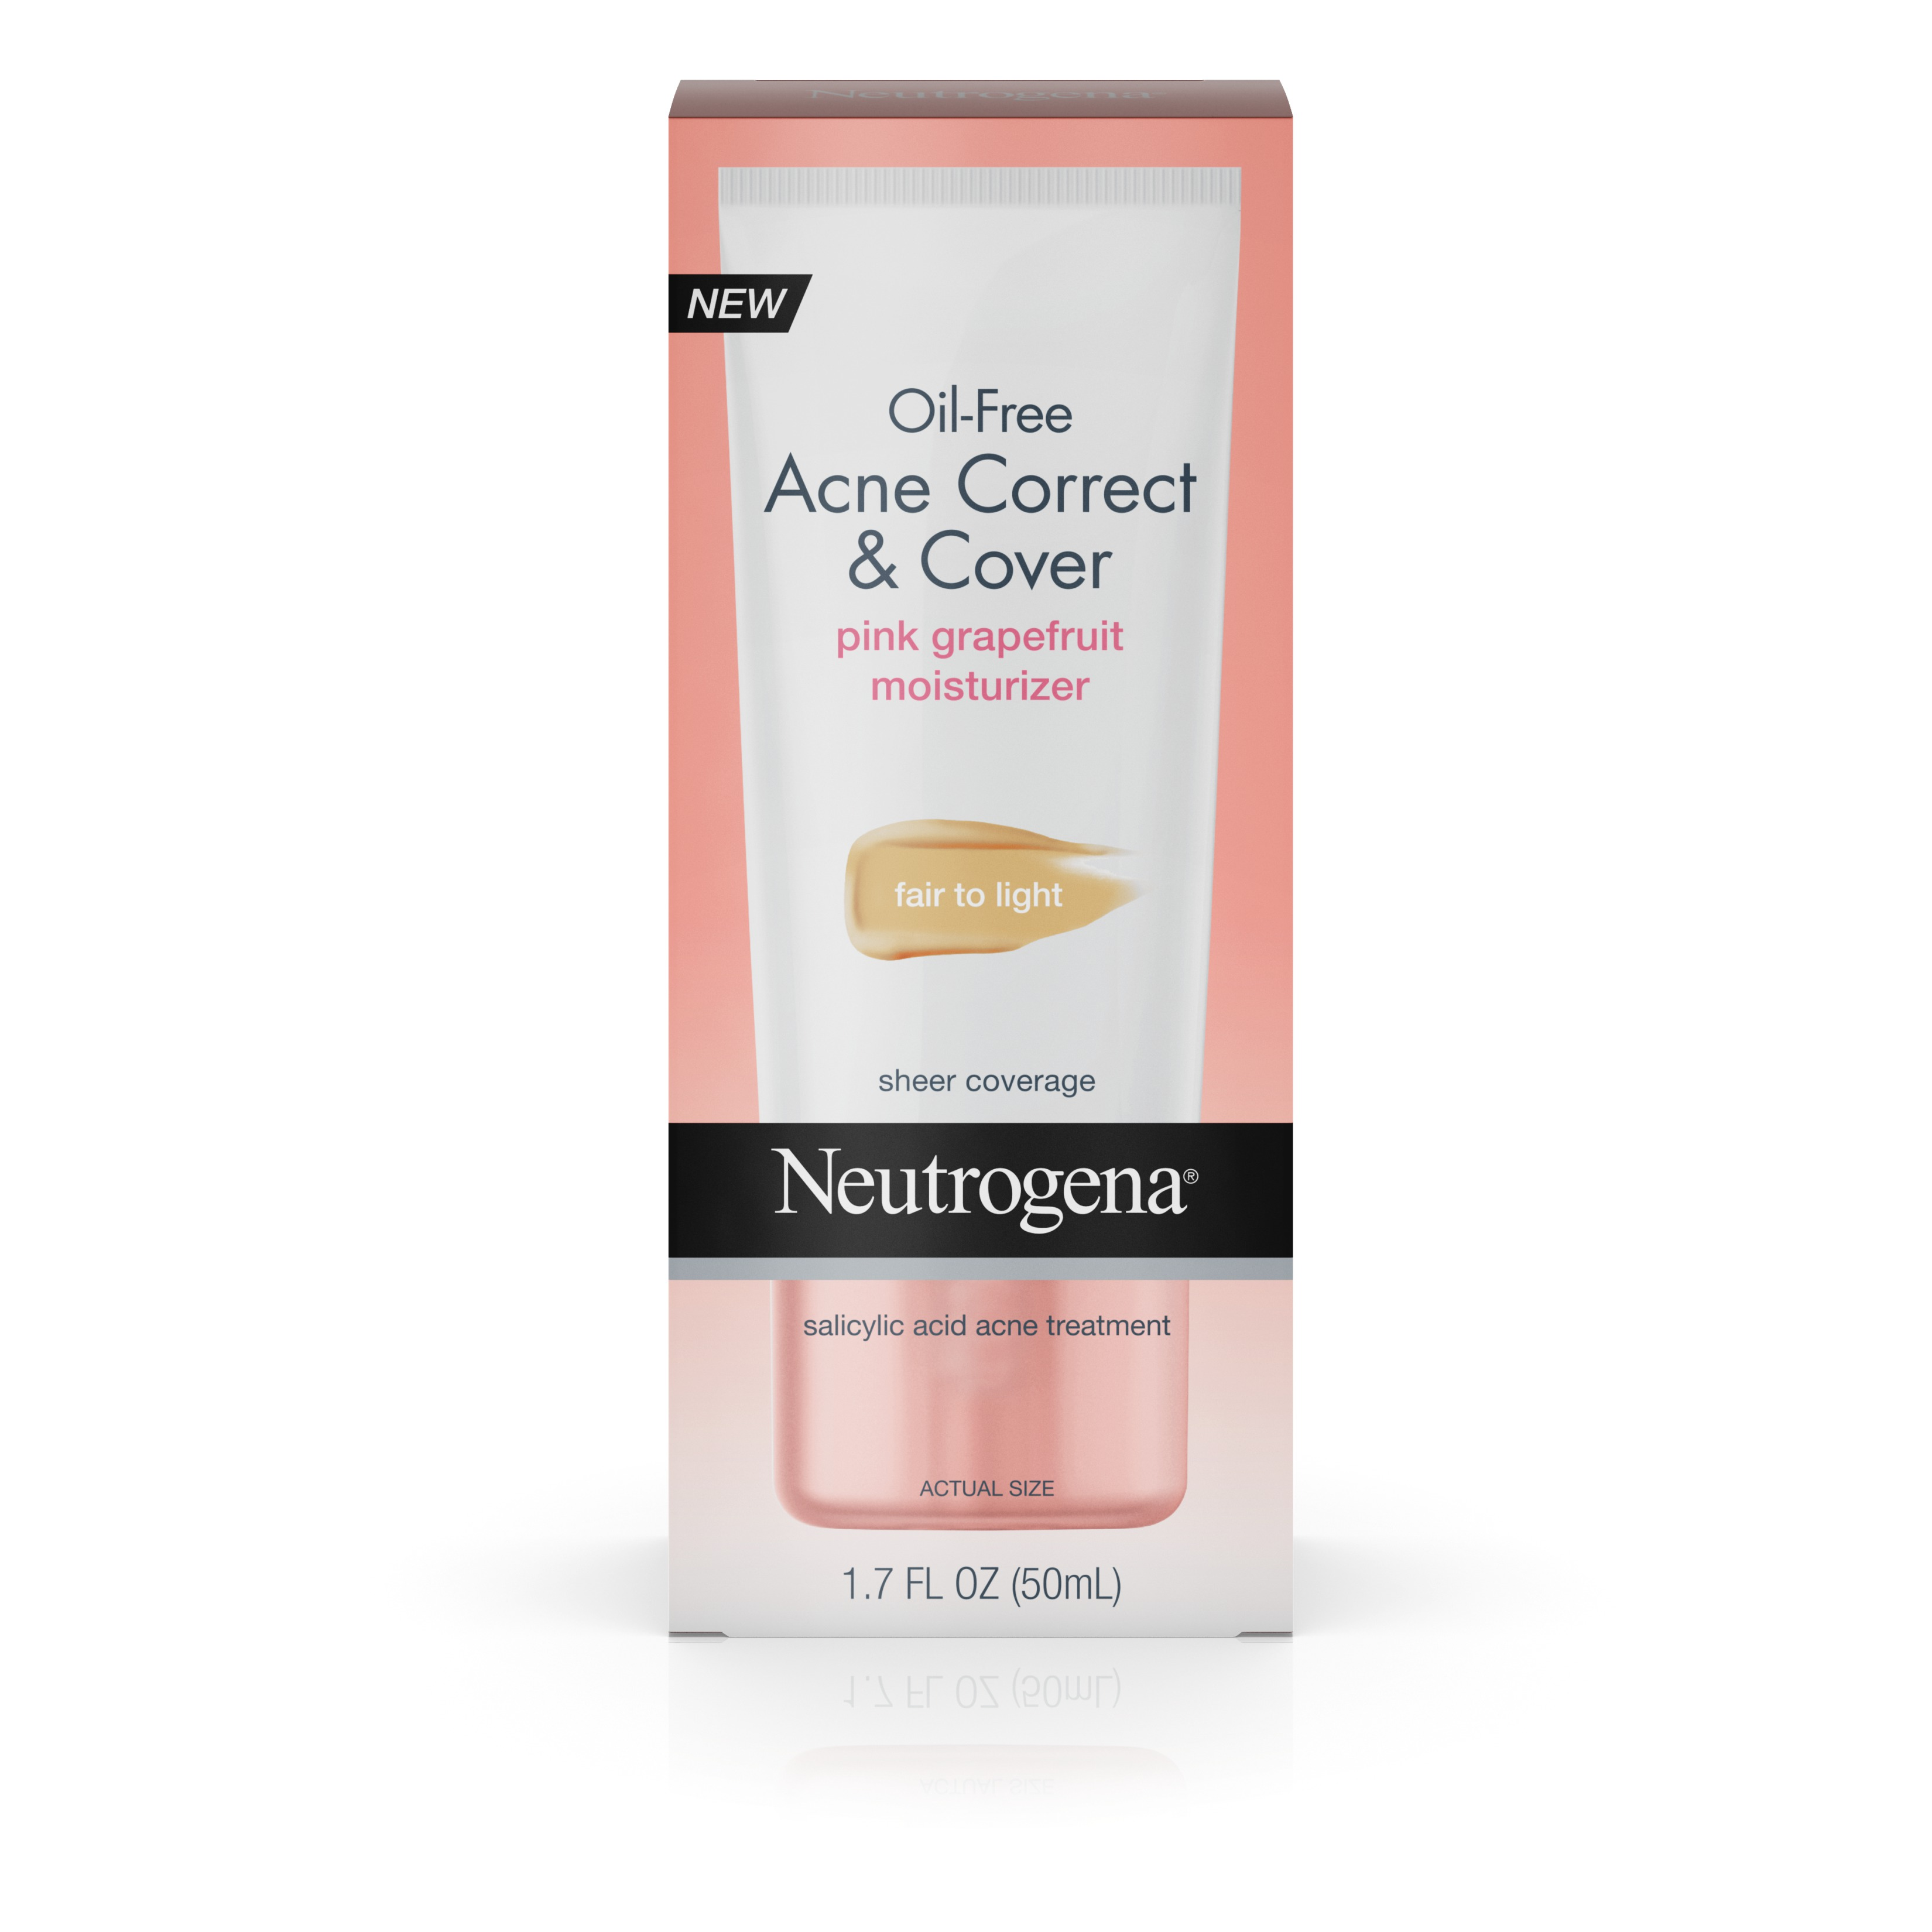 Neutrogena Oil-Free Acne Moisturizer Correct & Cover Pink Grapefruit, Medium To Tan, 1.7 Fl. Oz - Walmart.com